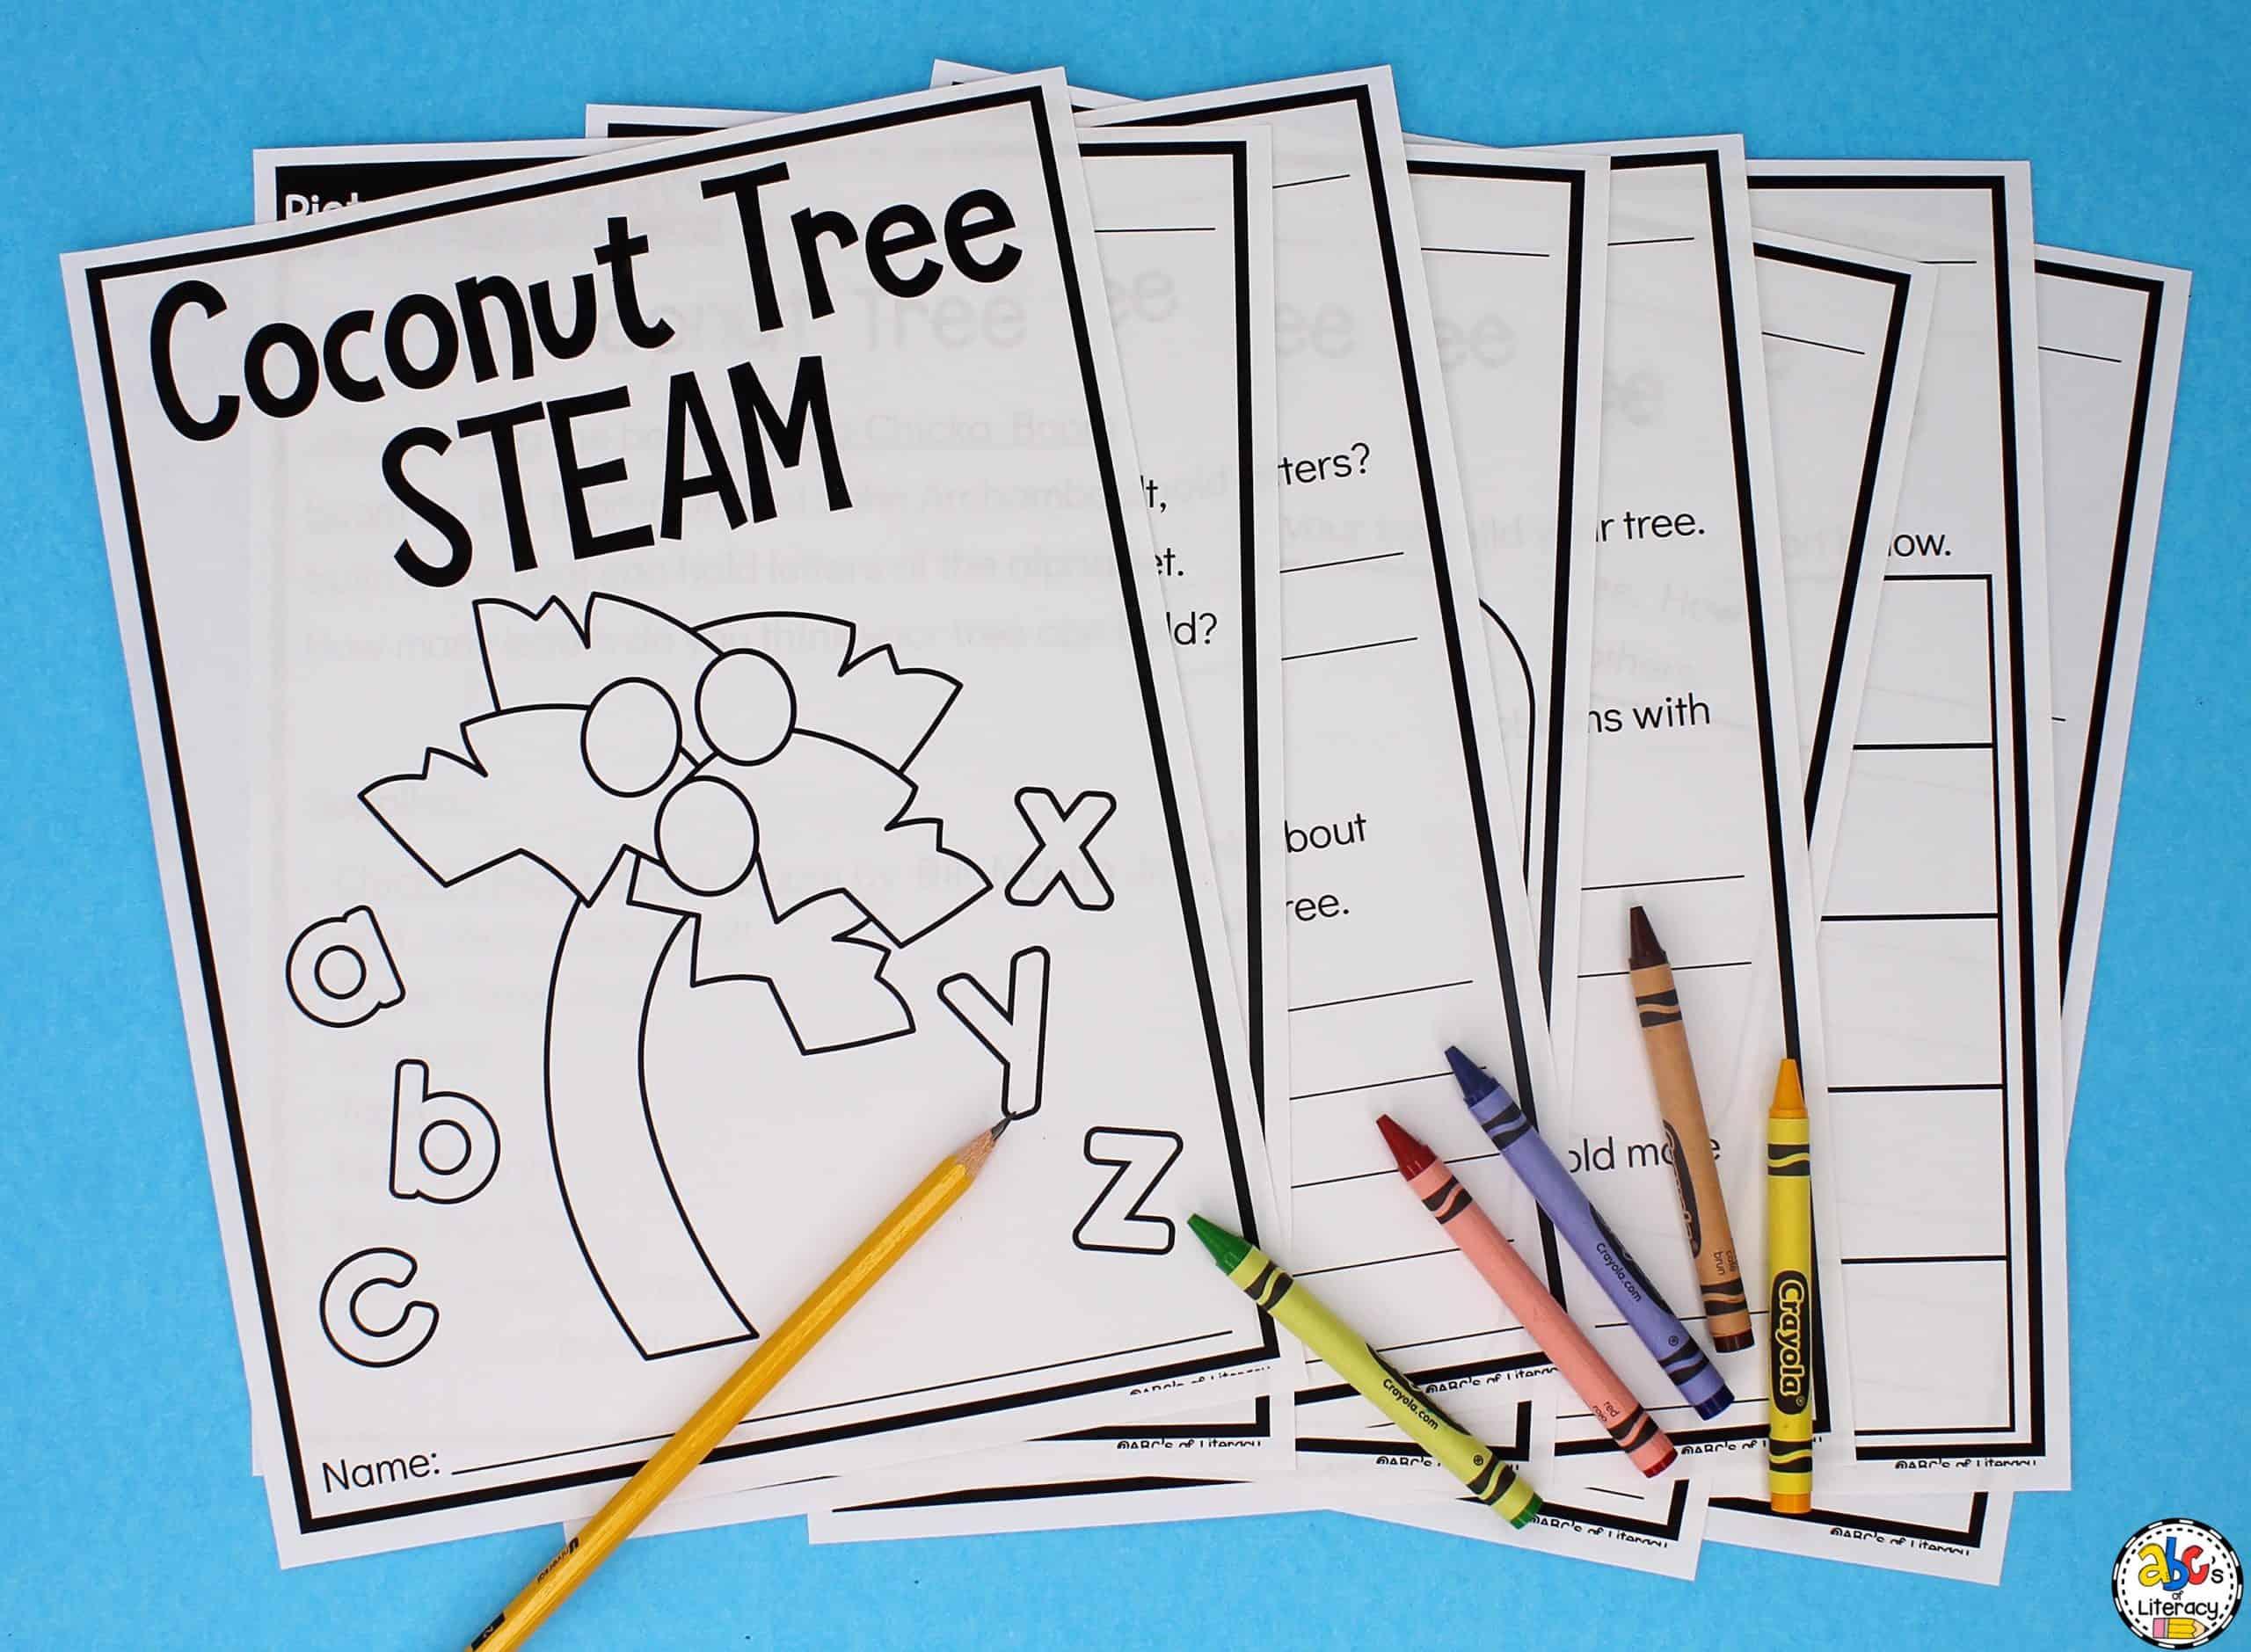 Coconut Tree STEAM Activity: Picture Book STEAM